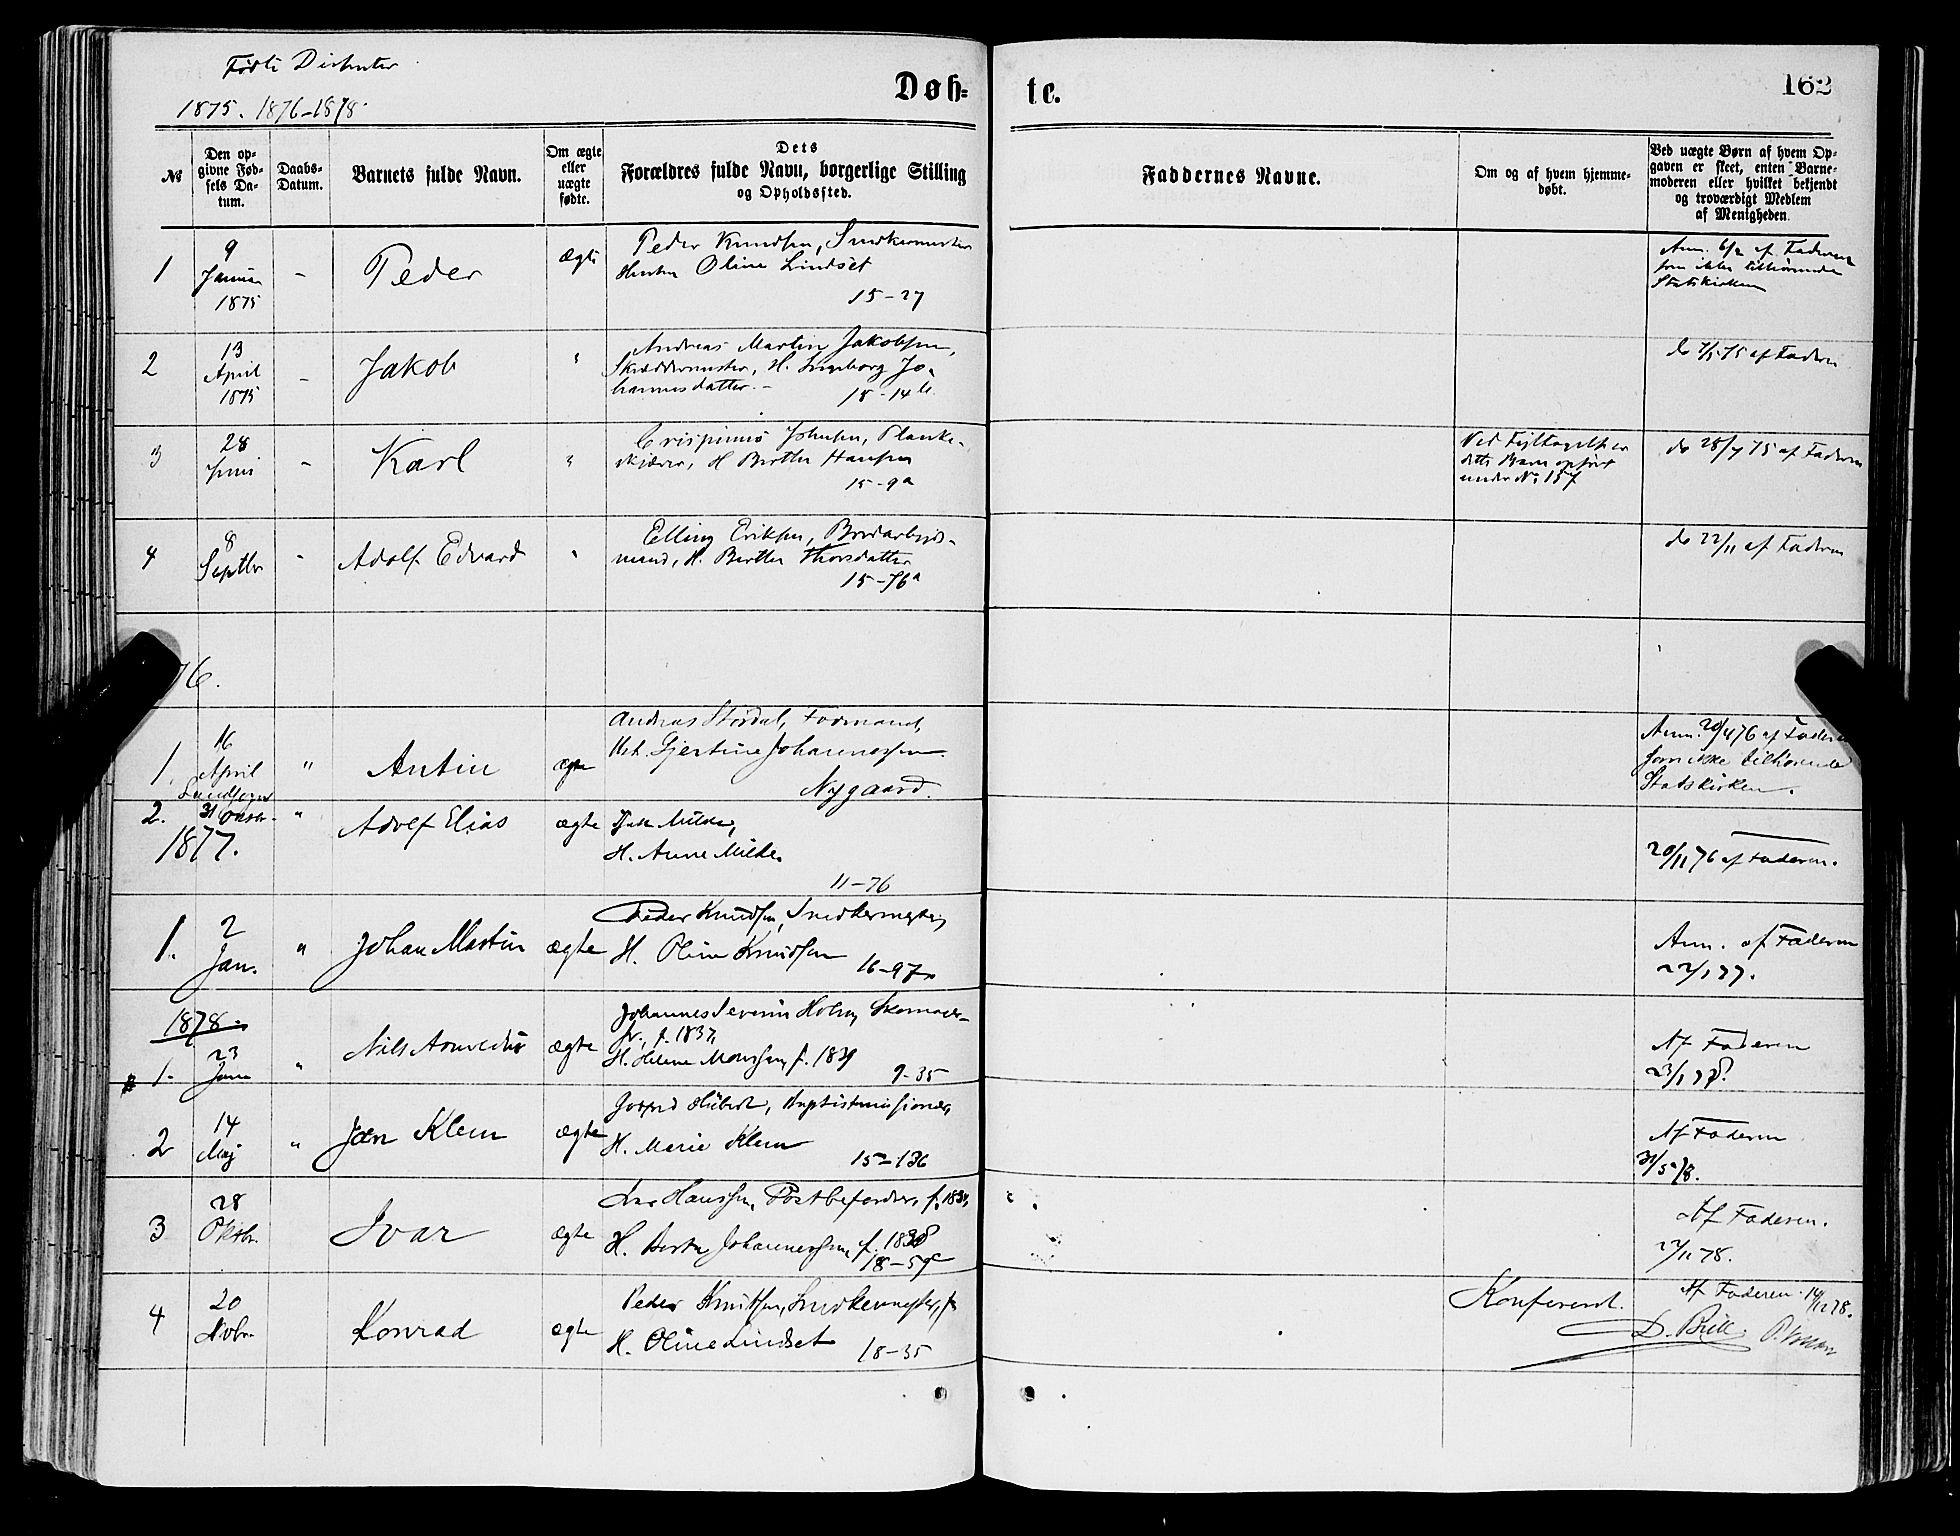 SAB, Domkirken sokneprestembete, H/Haa/L0022: Parish register (official) no. B 5, 1872-1878, p. 162